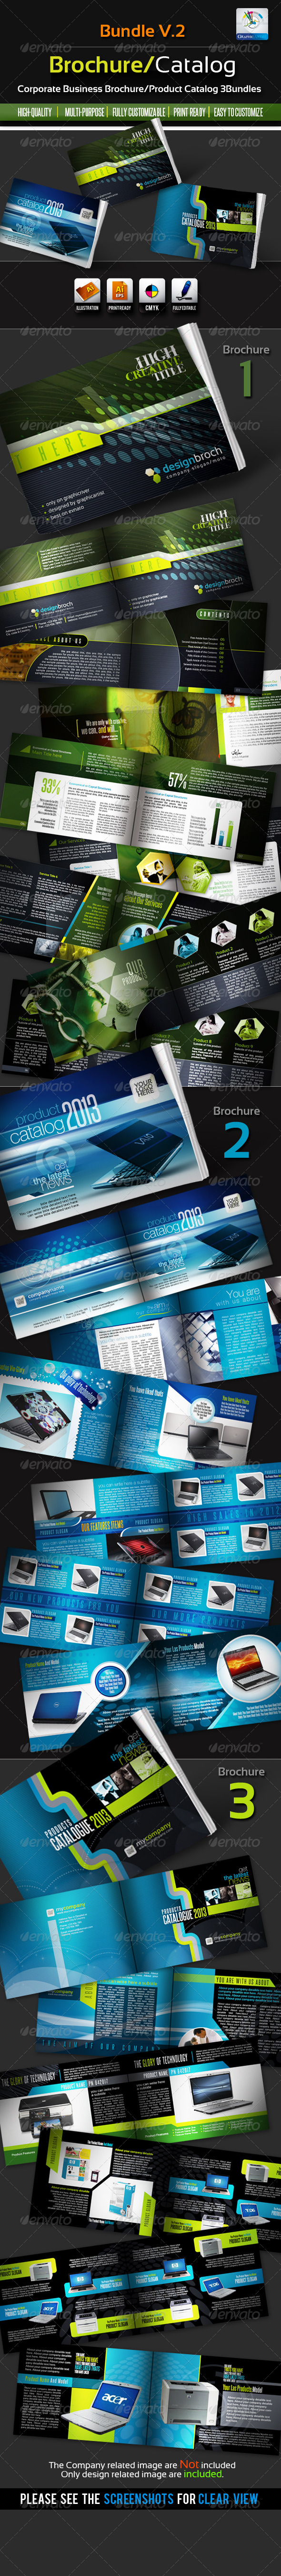 Corporate Brochure/Catalogue Bundles v.2 - Catalogs Brochures